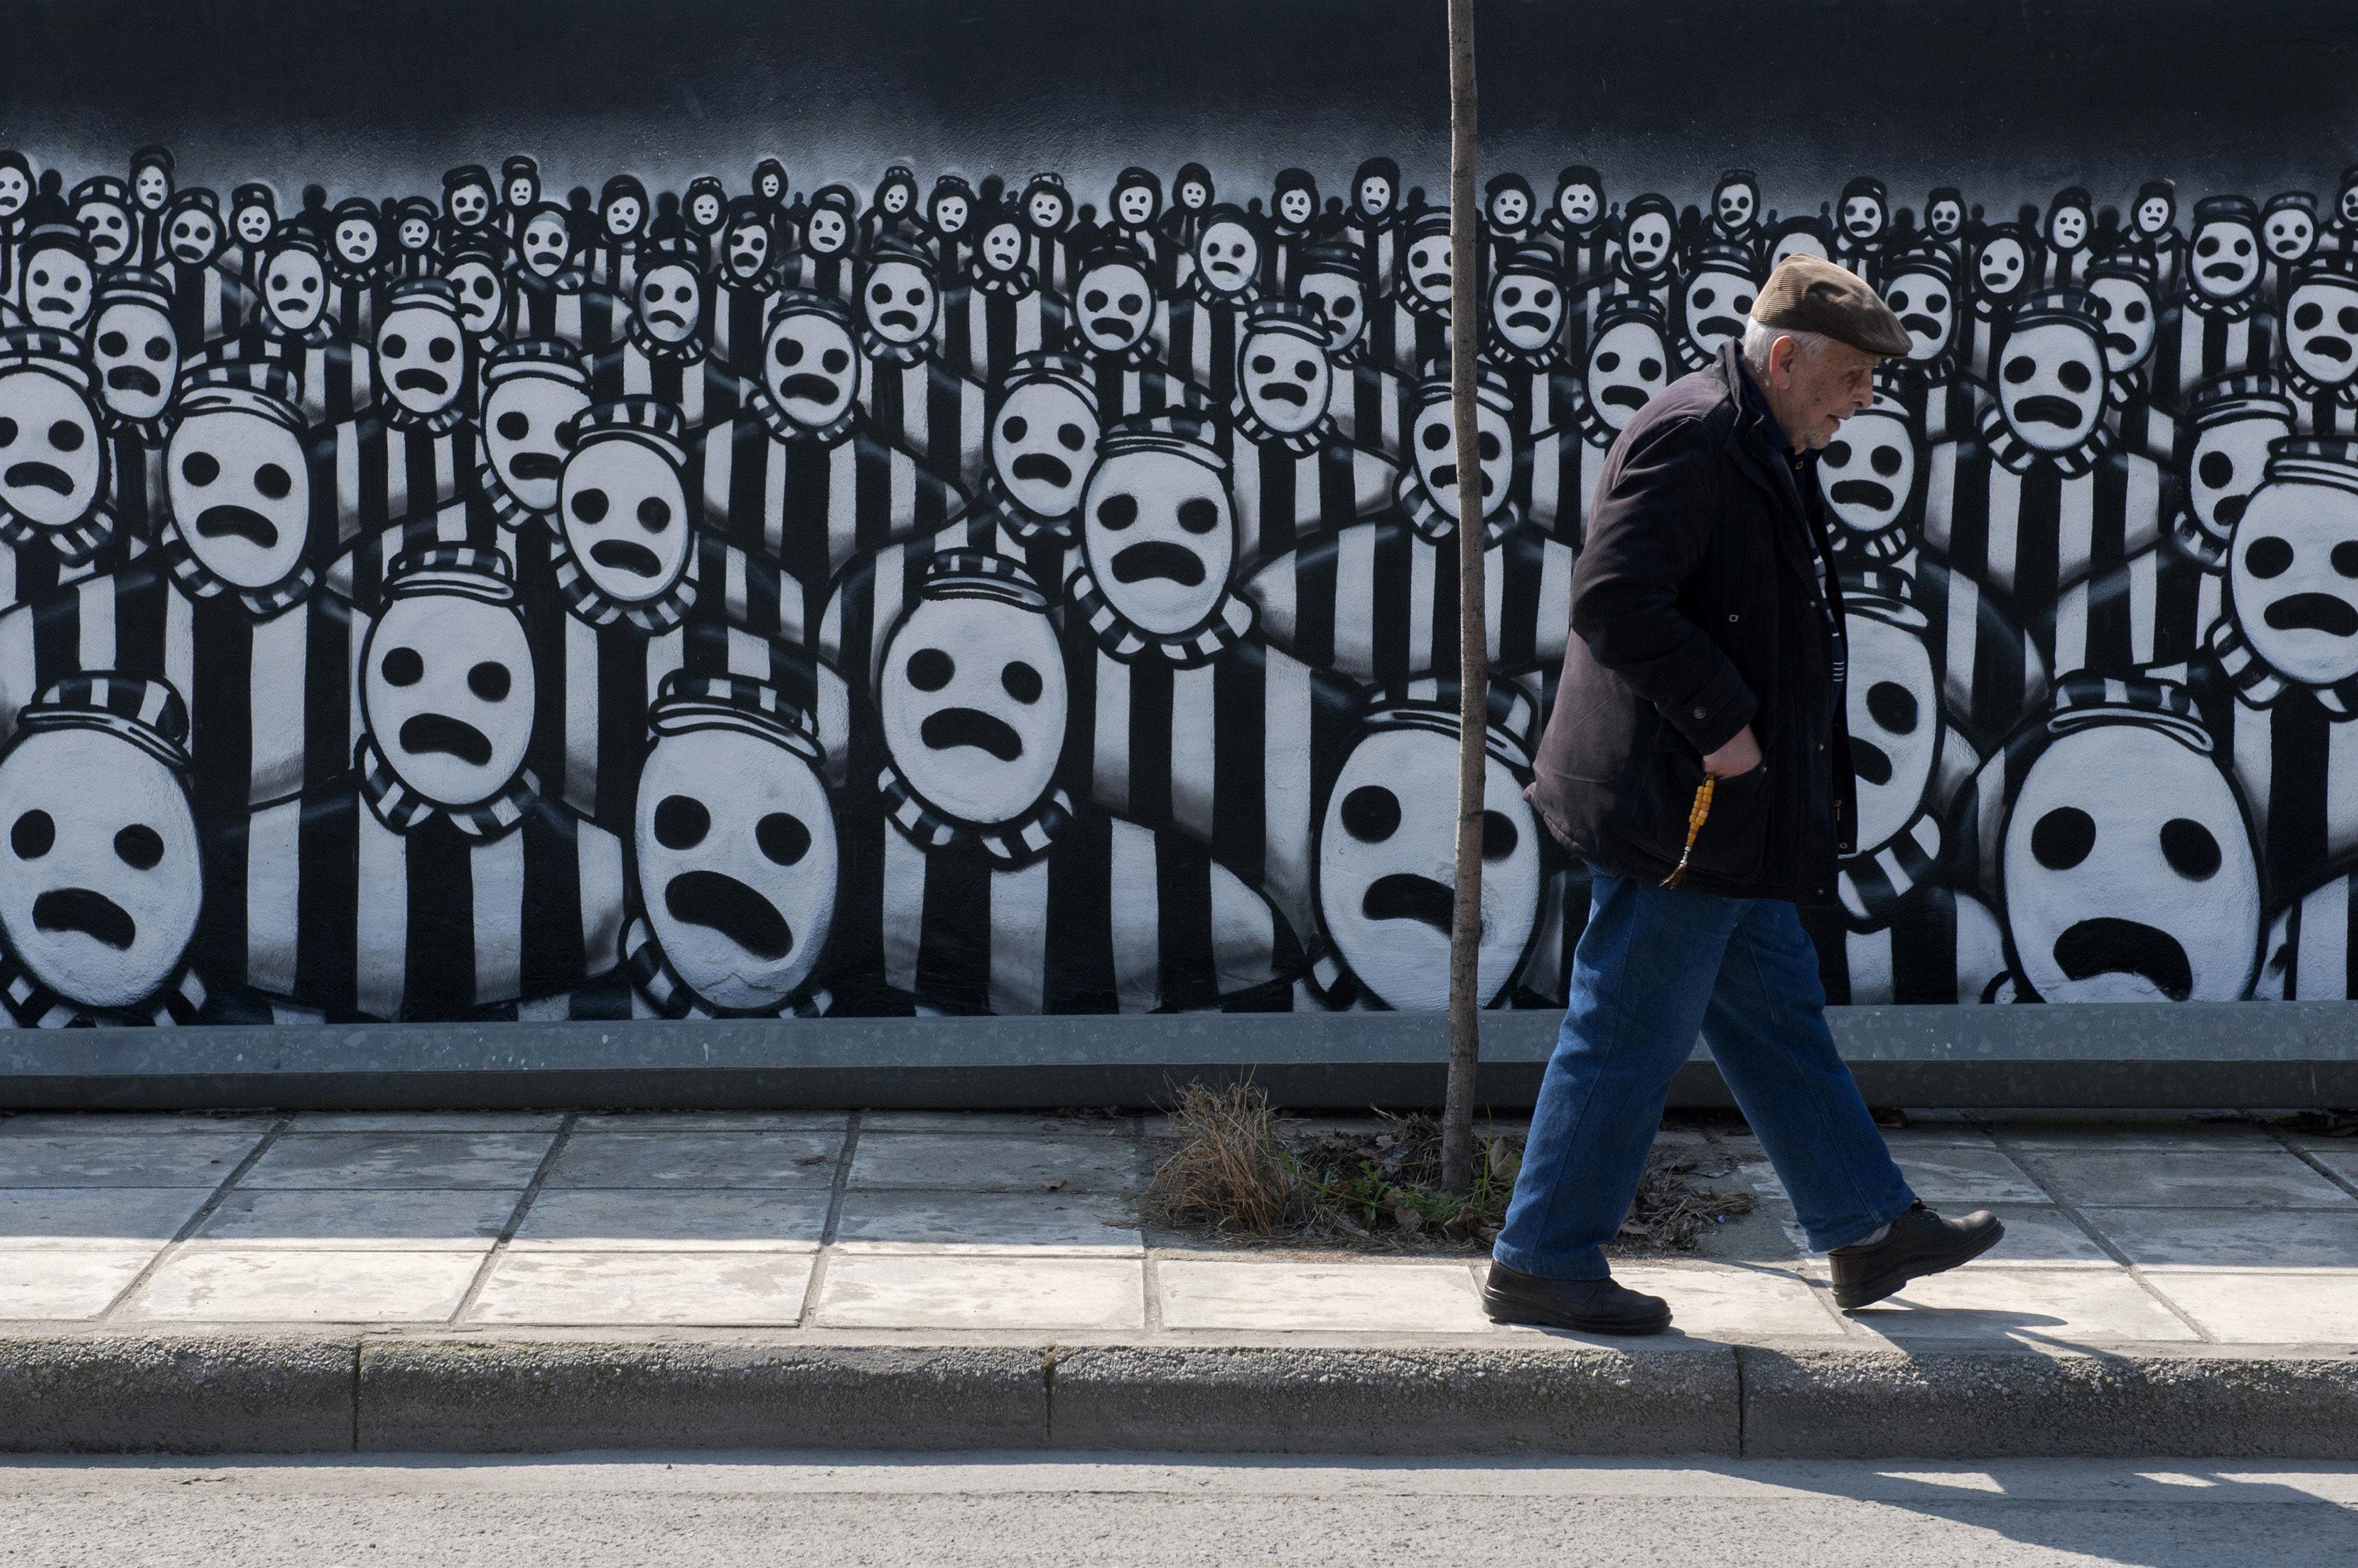 Graffiti αφιερωμένο στα θύματα του Ολοκαυτώματος (Θεσσαλονίκη)